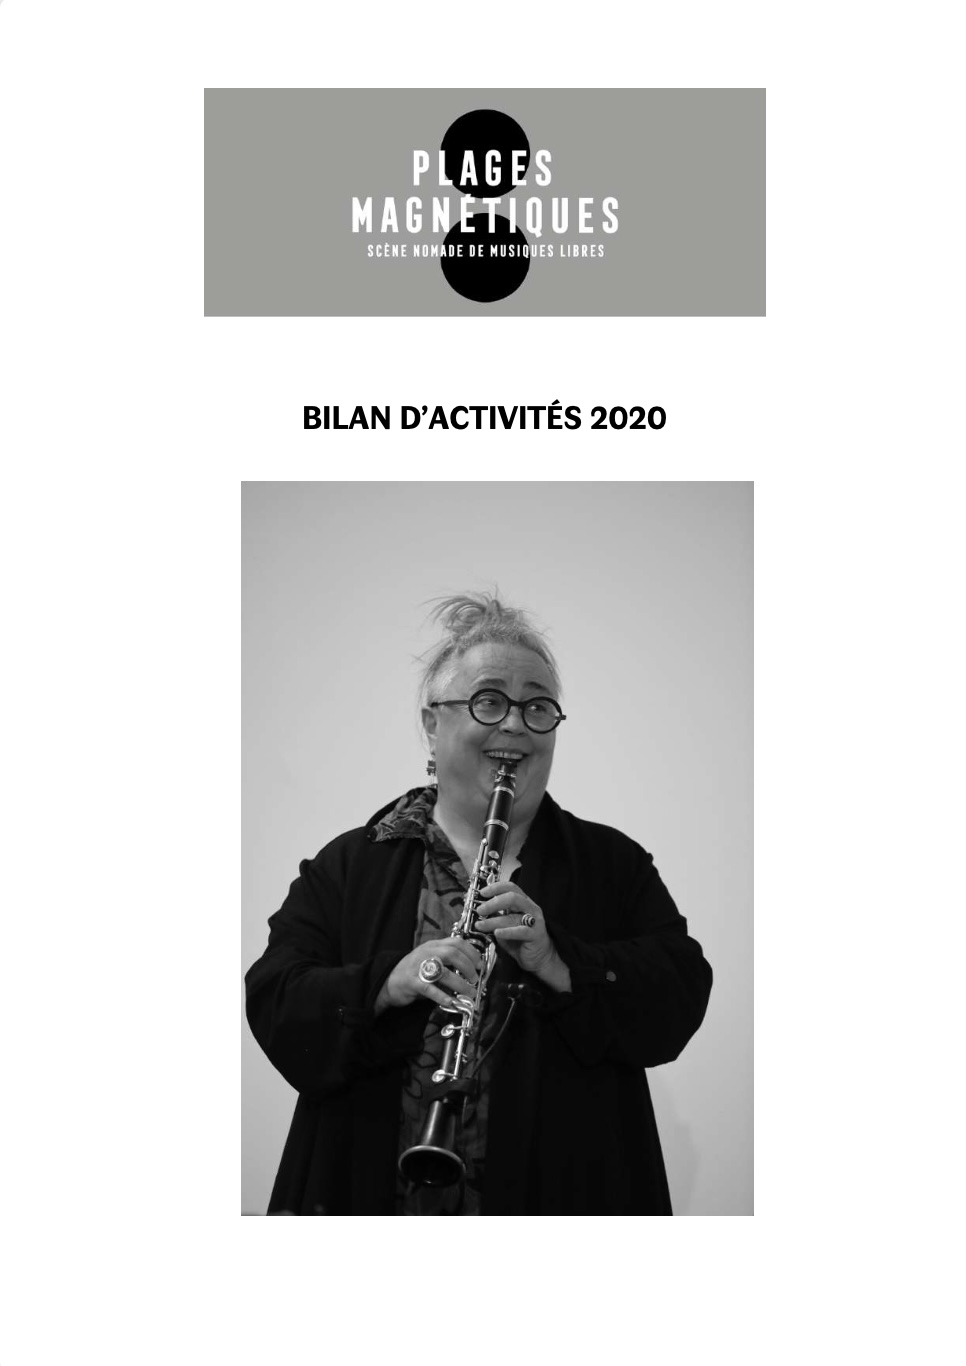 BILAN ACTIVITES 2020